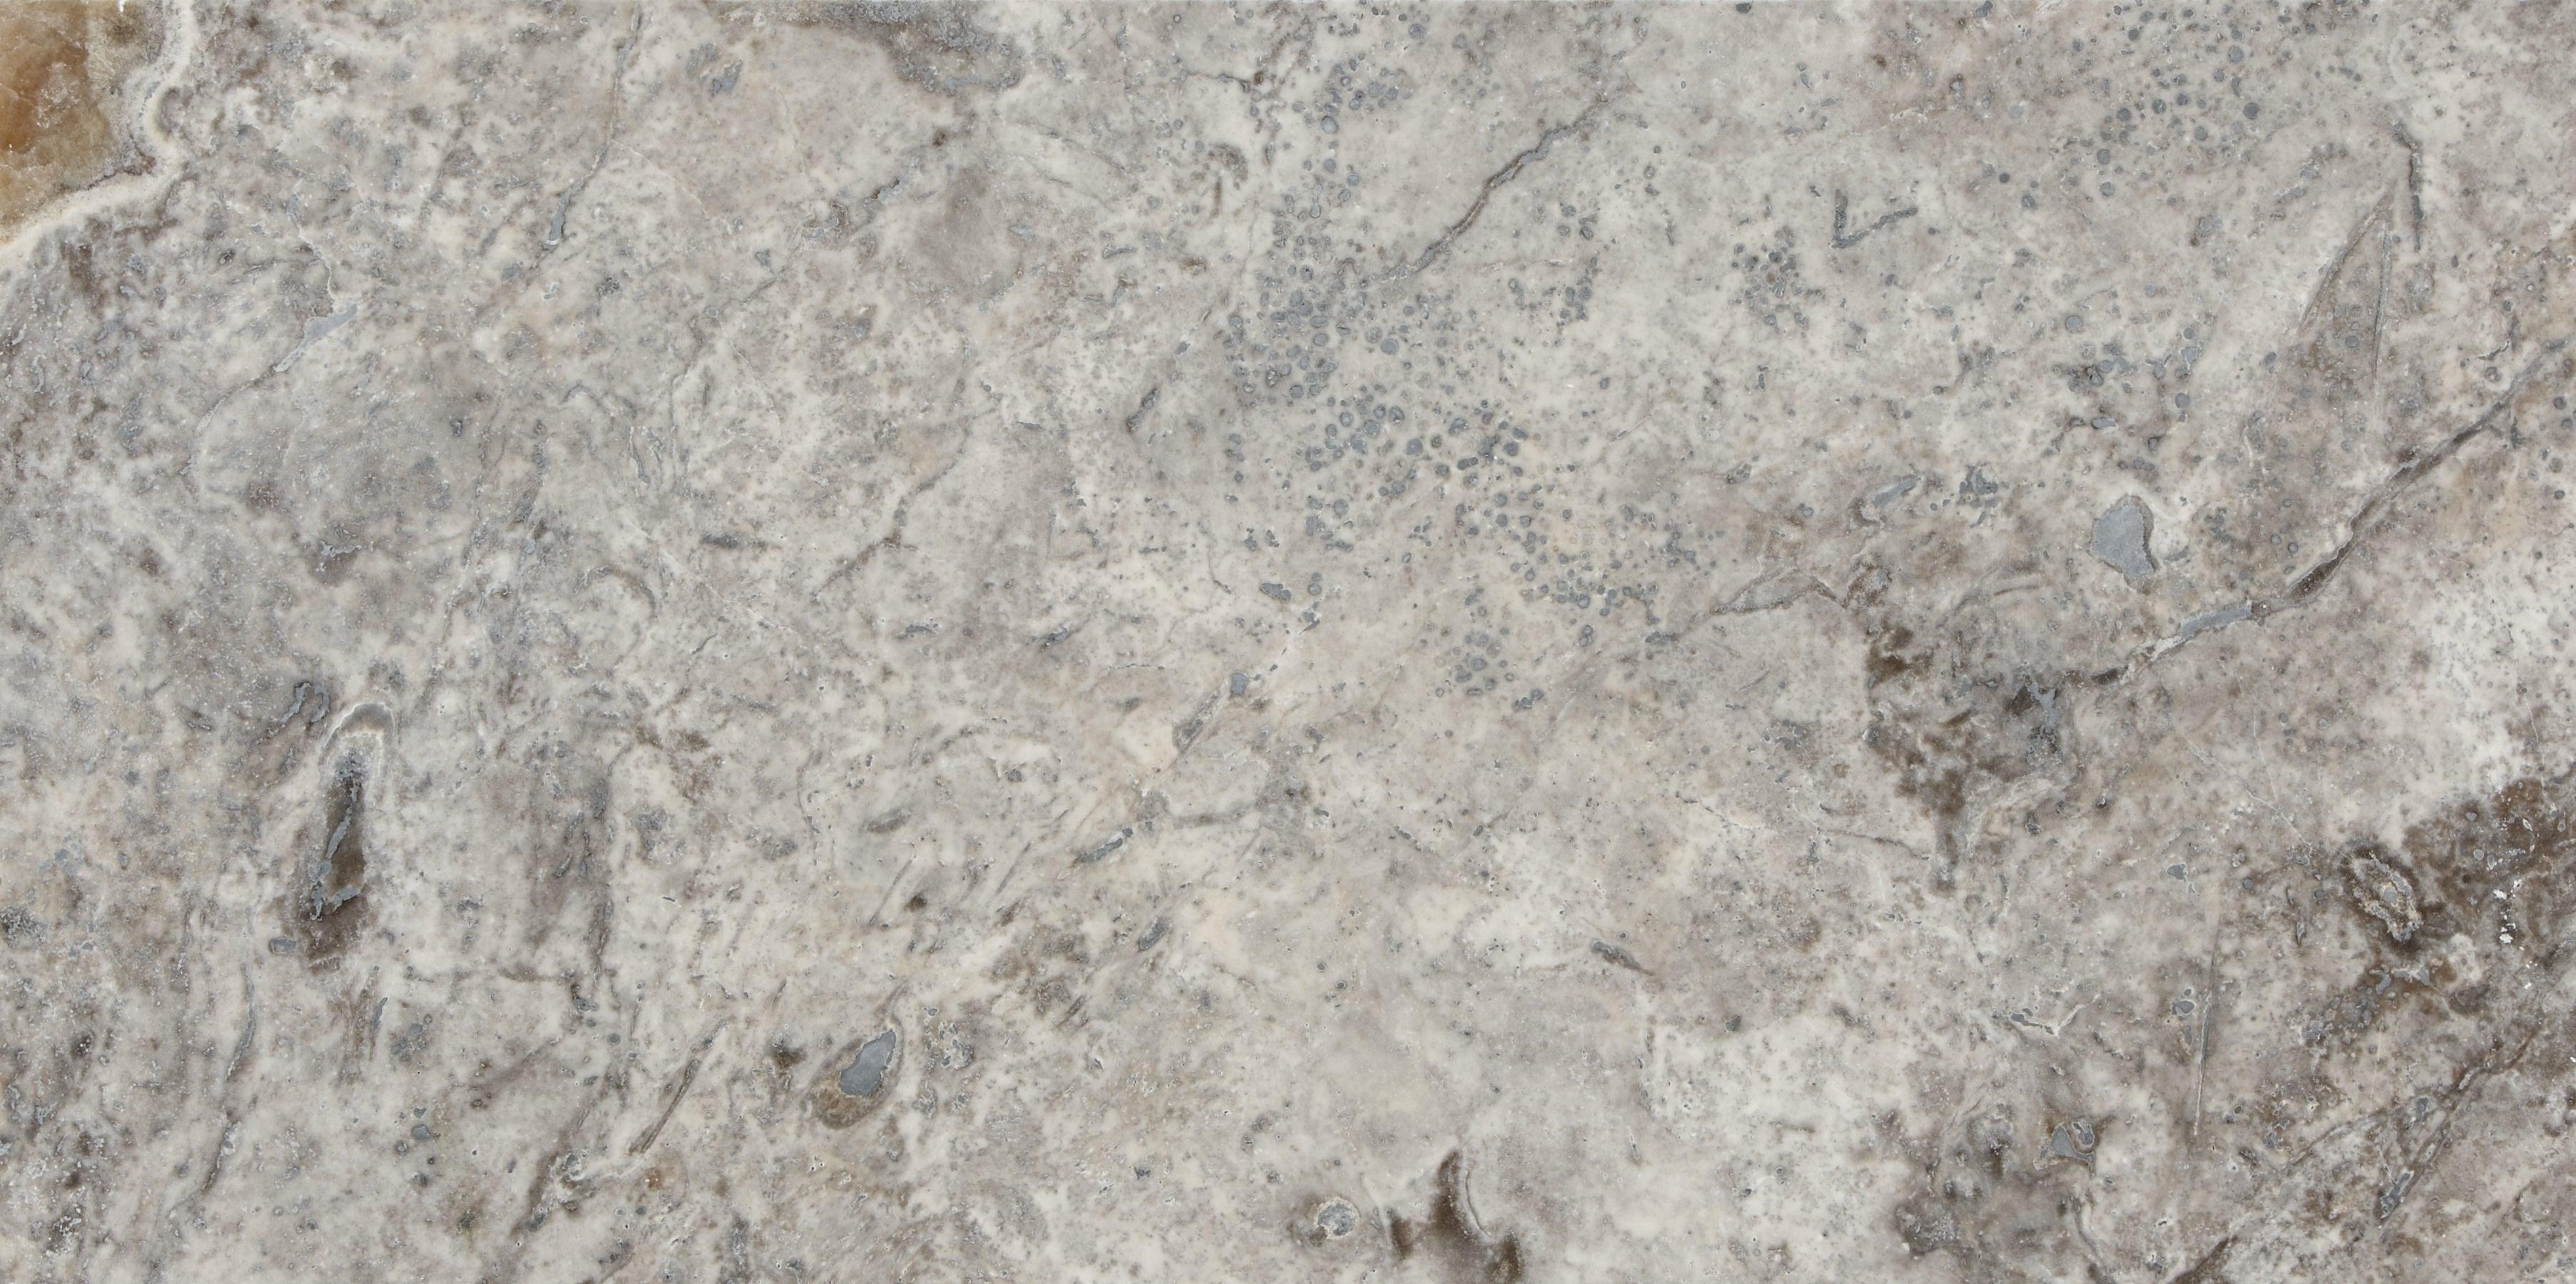 Black Travertine Stone : Travertin silver beautiful travertine with